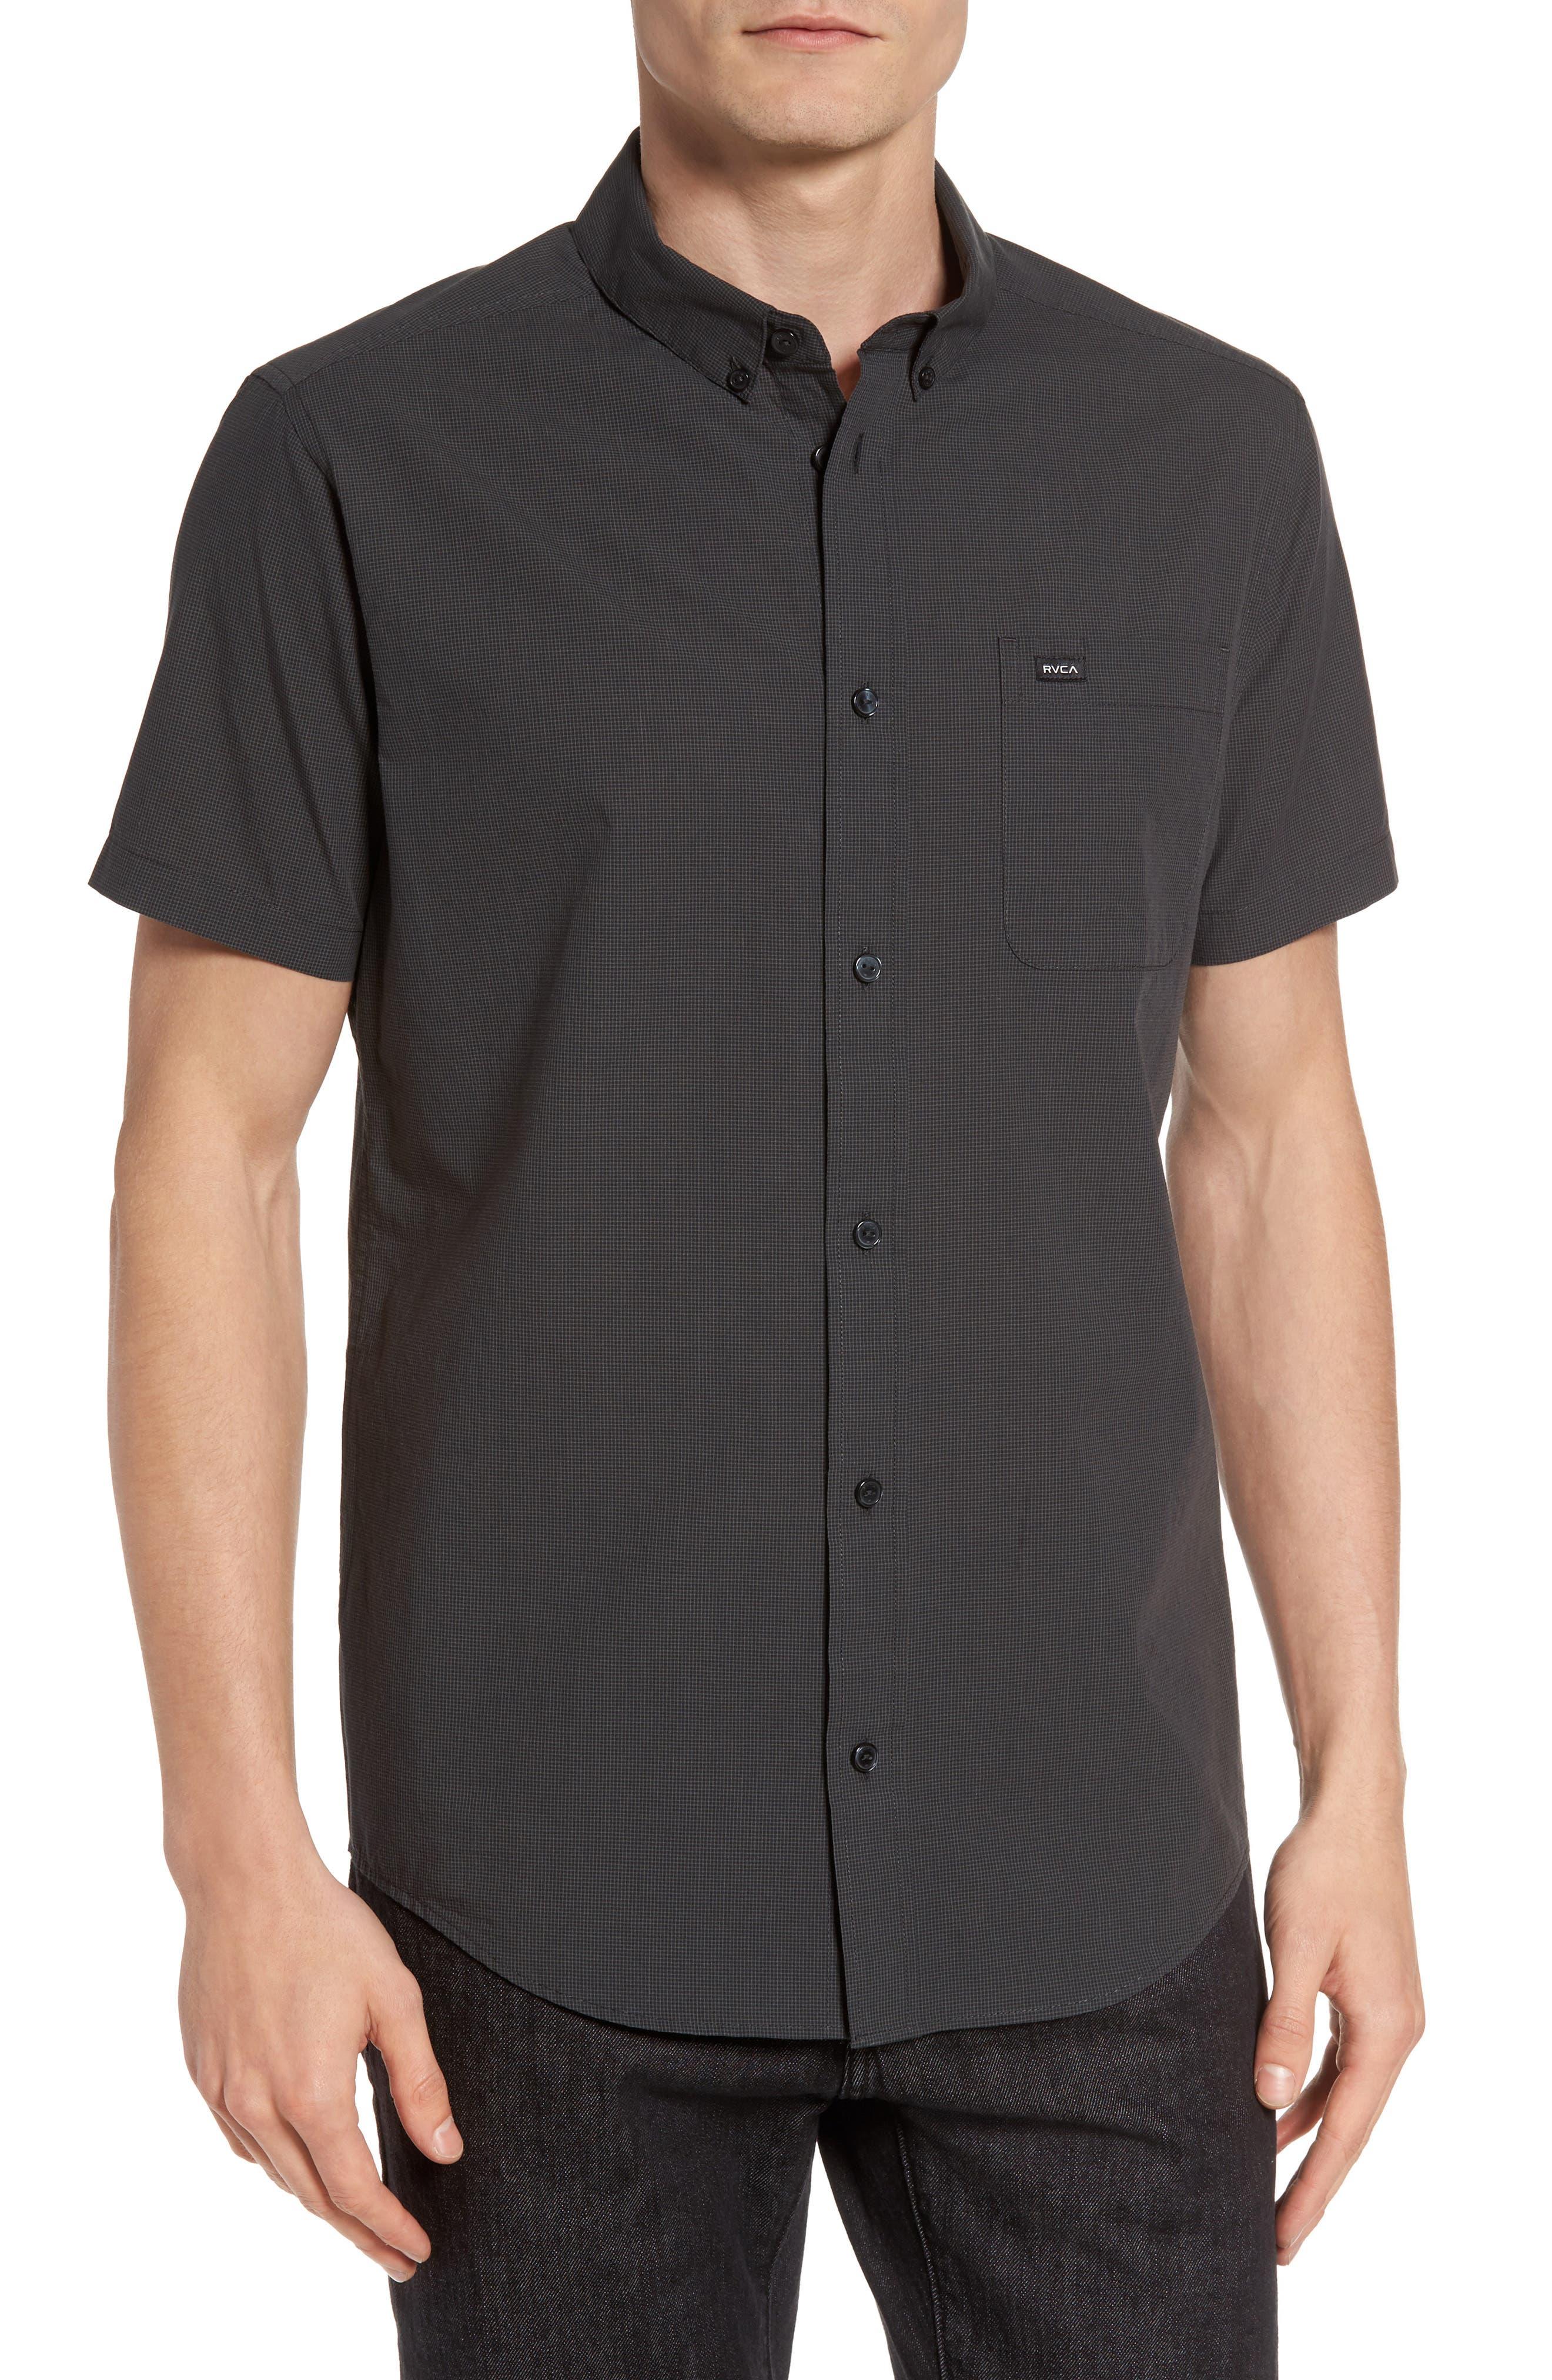 RVCA That'll Do Microcheck Woven Shirt